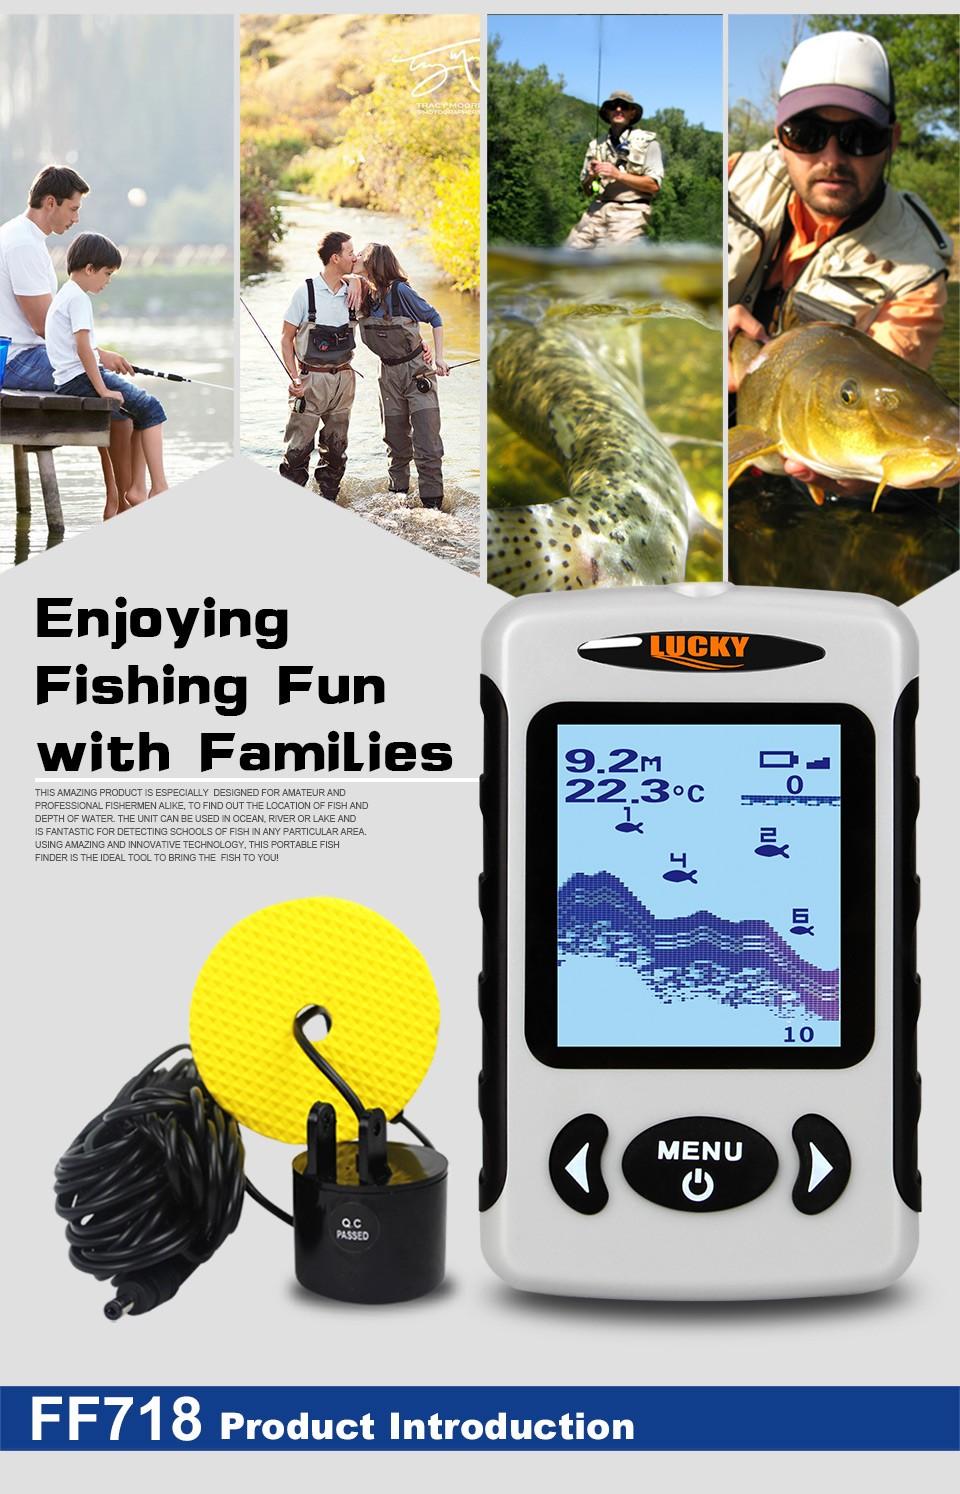 FF718 fish finder_02